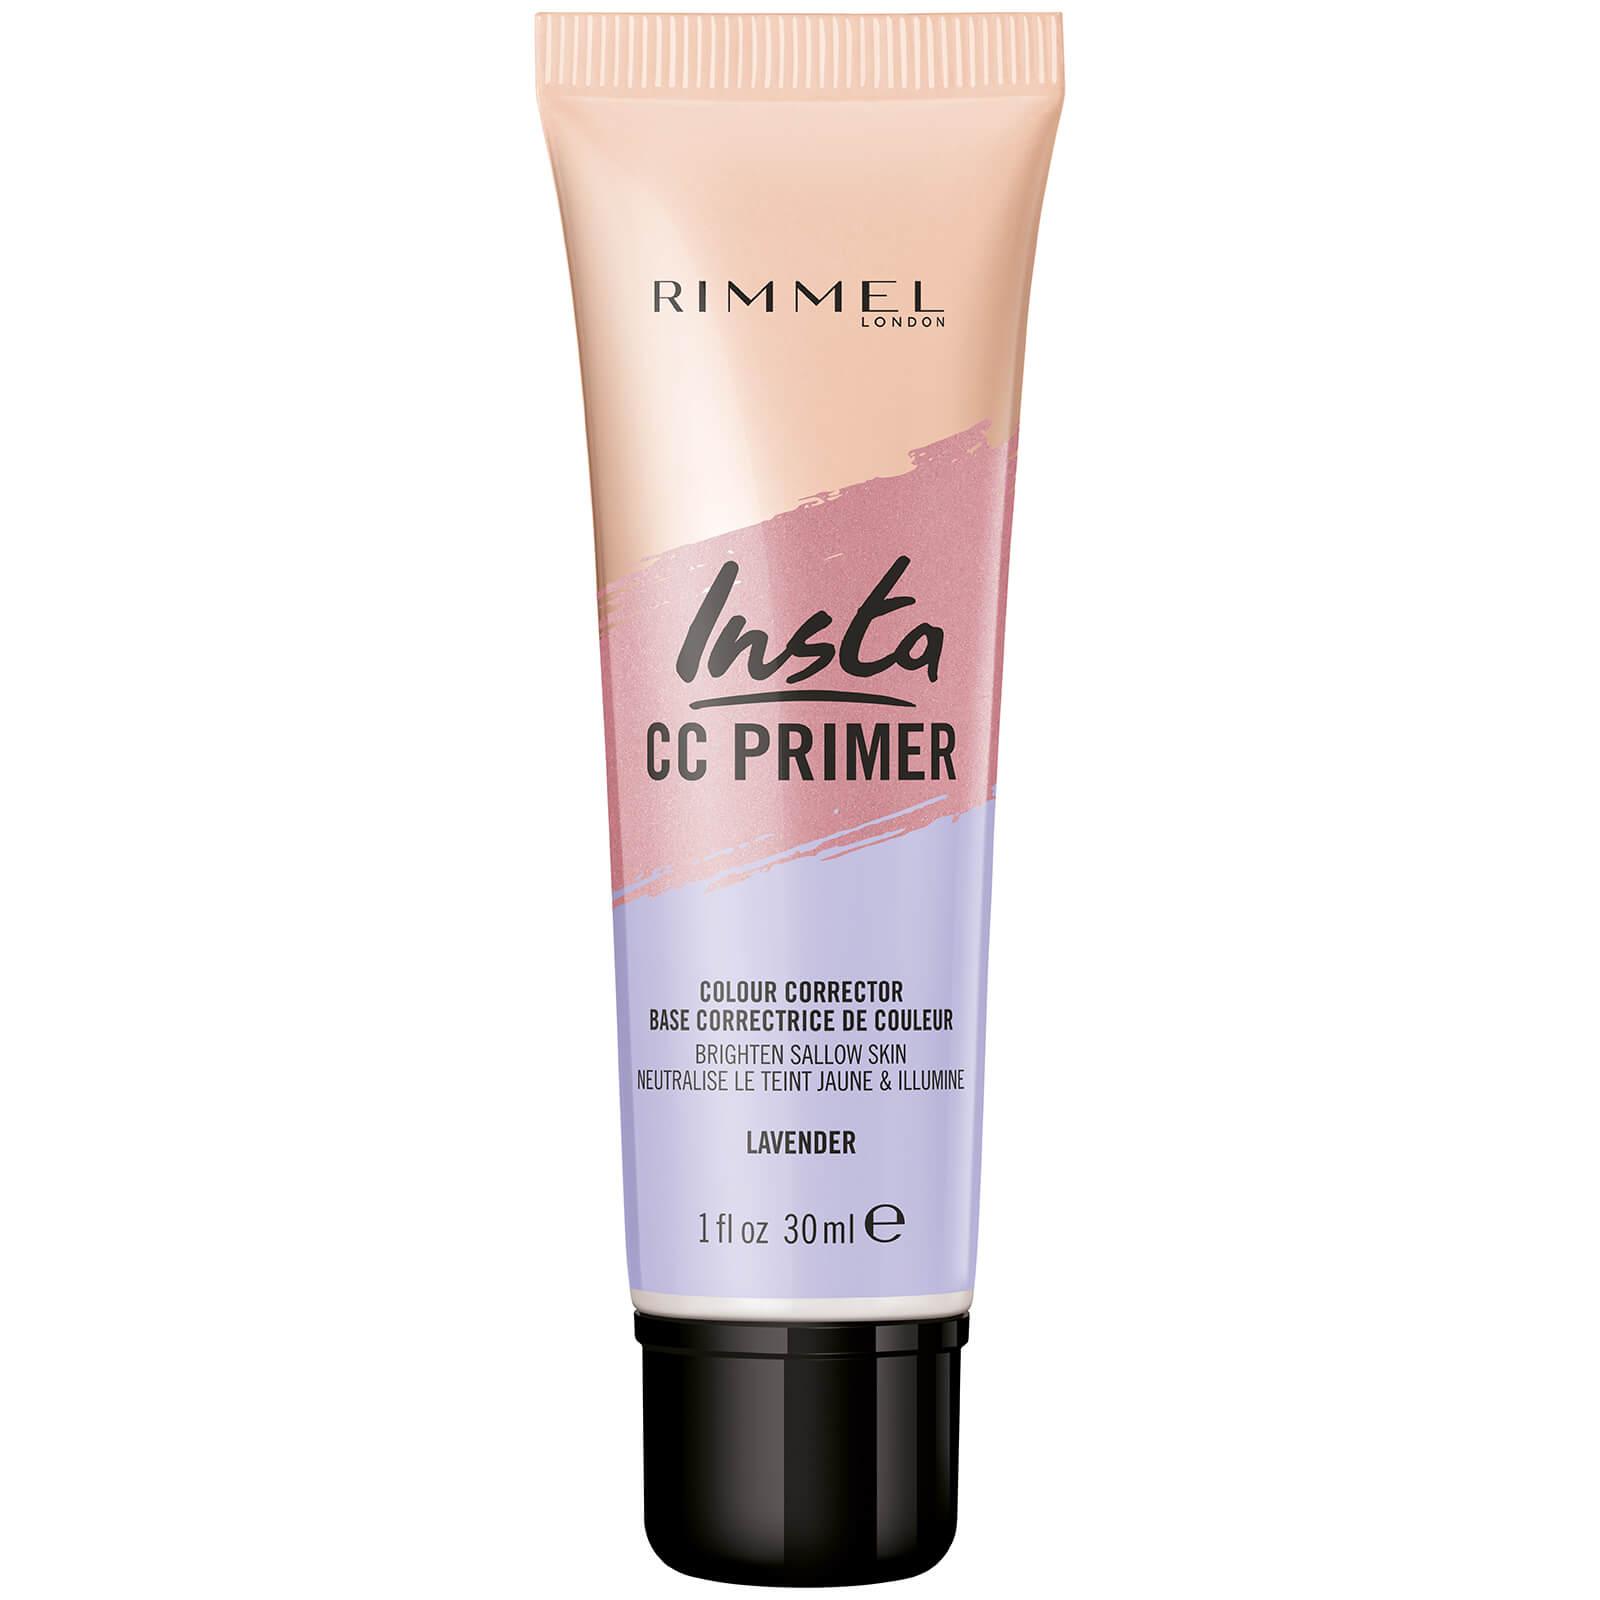 Rimmel Insta Colour Correcting Primer 30ml (Various Shades)